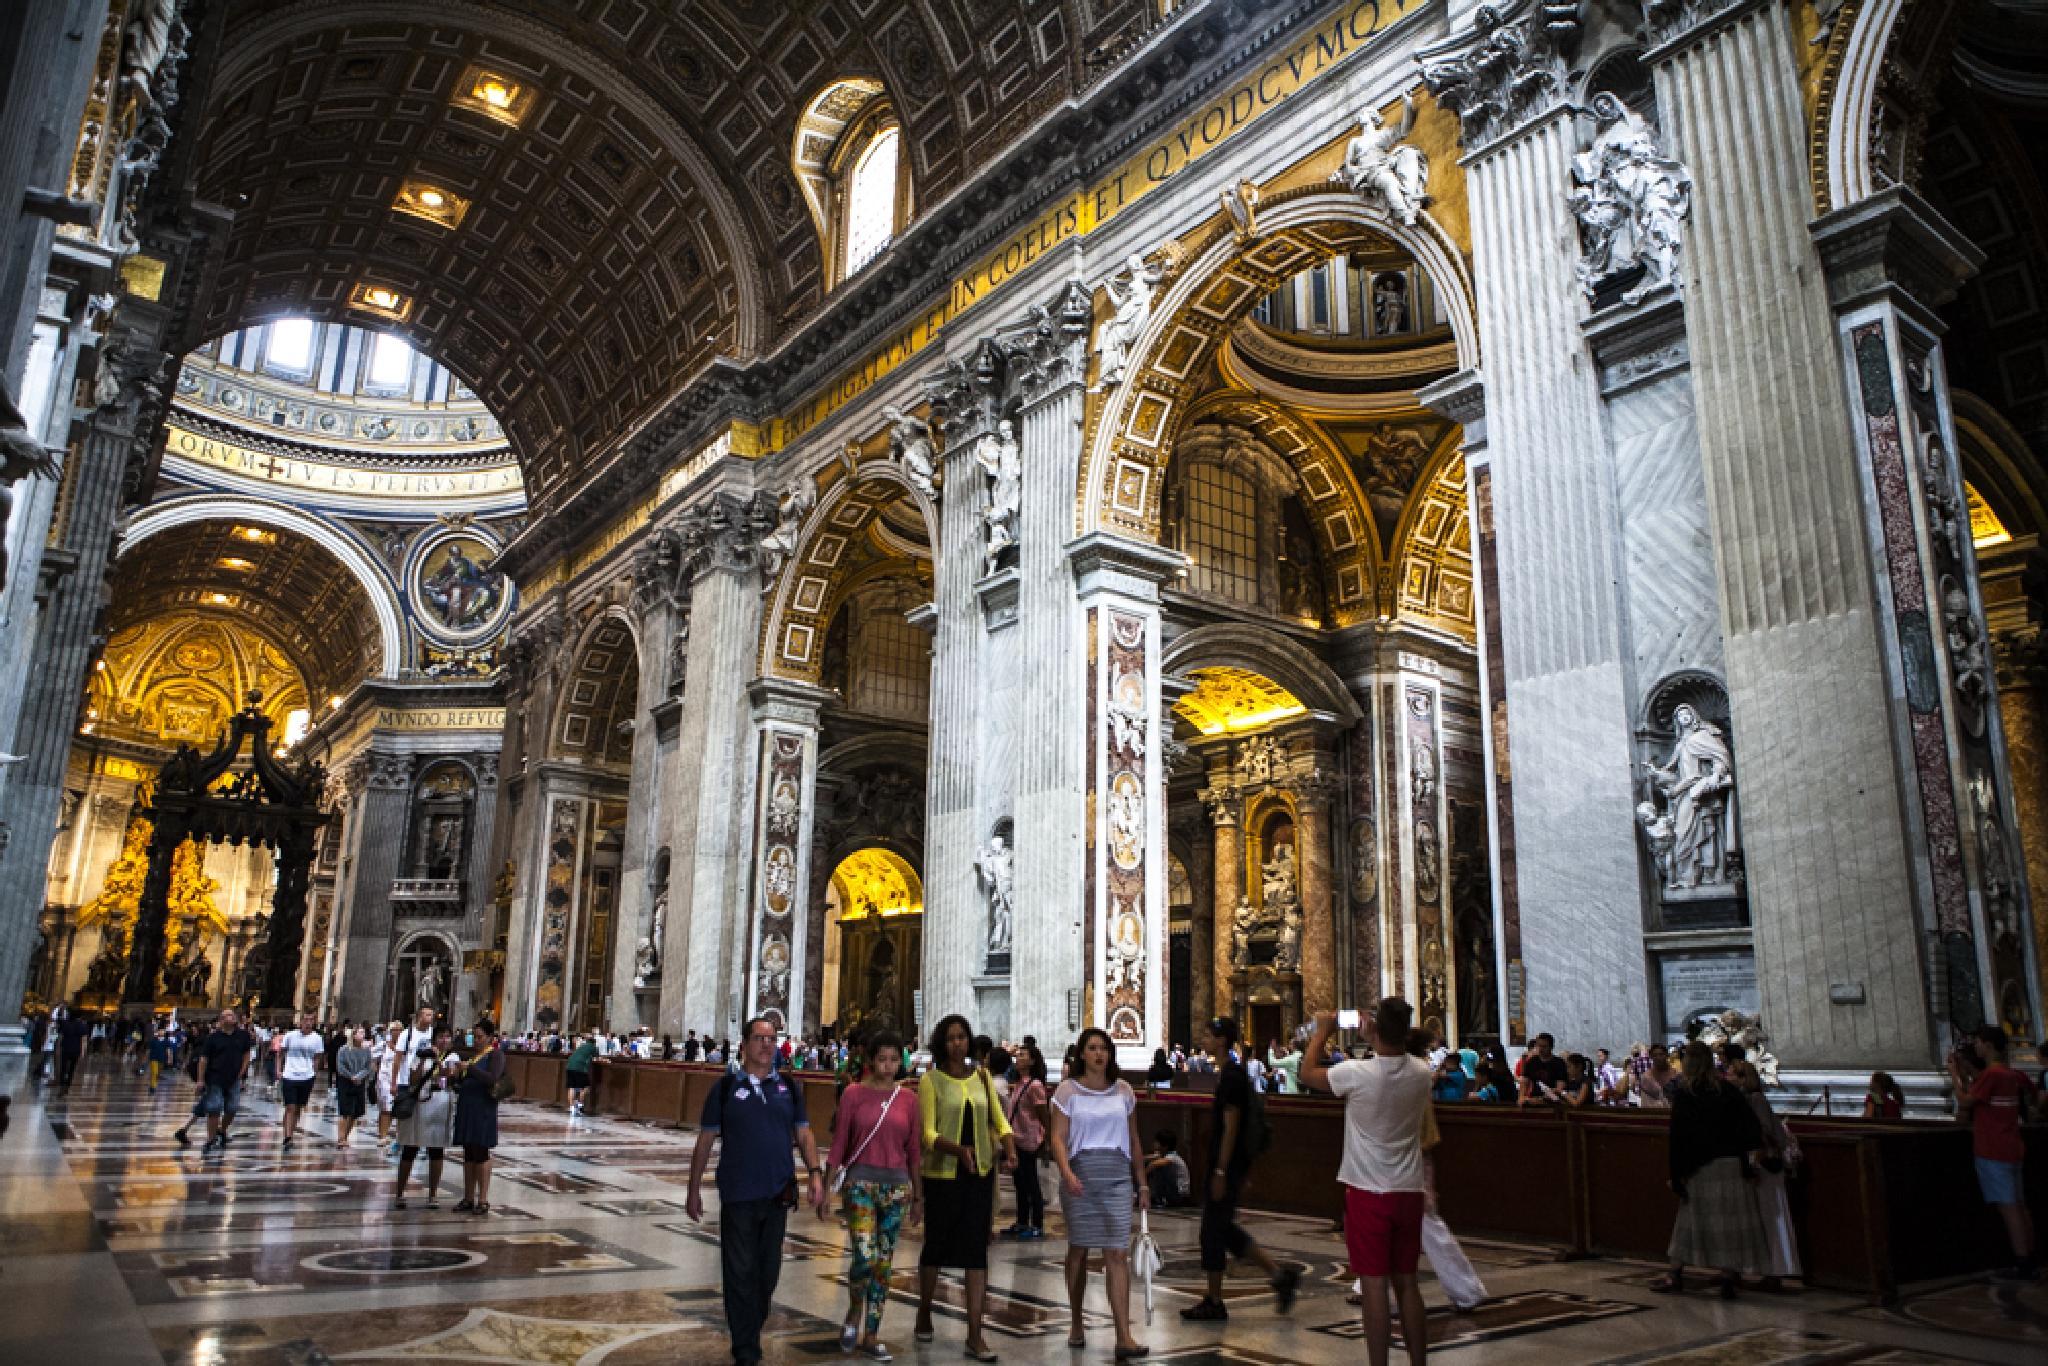 Vatican City, 2014 by ammar.qasira